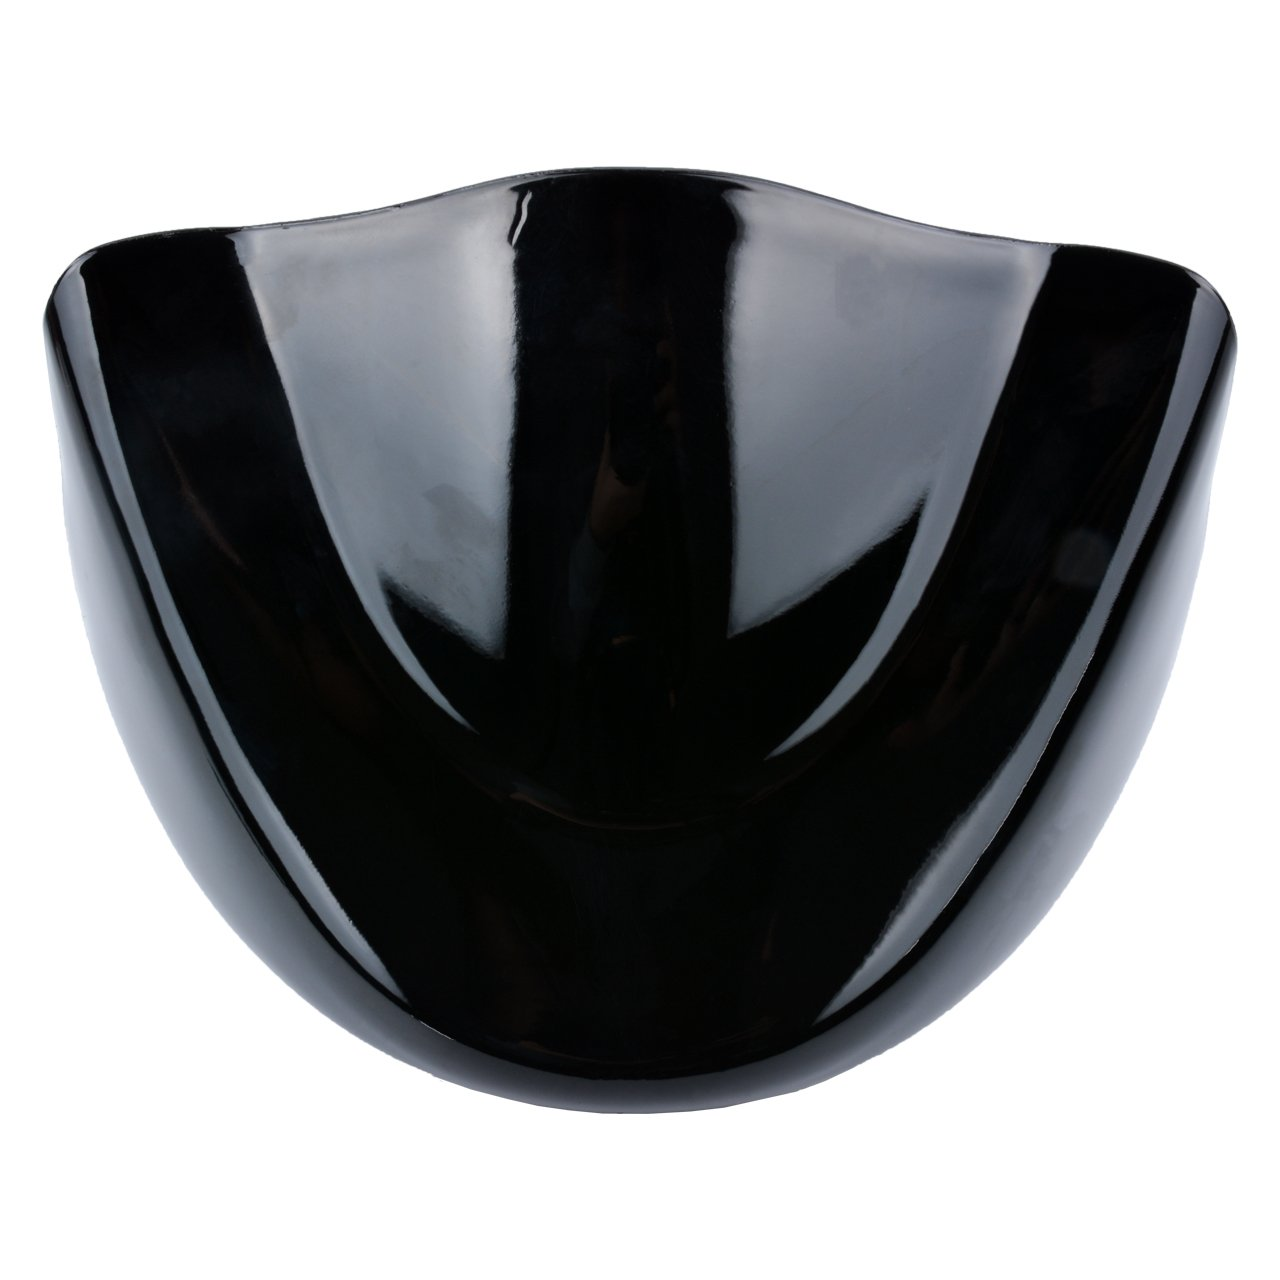 TUINCYN Moto universel Garde-boue Coque kit Noir mat menton avant Spoiler pour Harley Davidson Sportster 2004 2014/Xl883/Xl1200/2004 2015